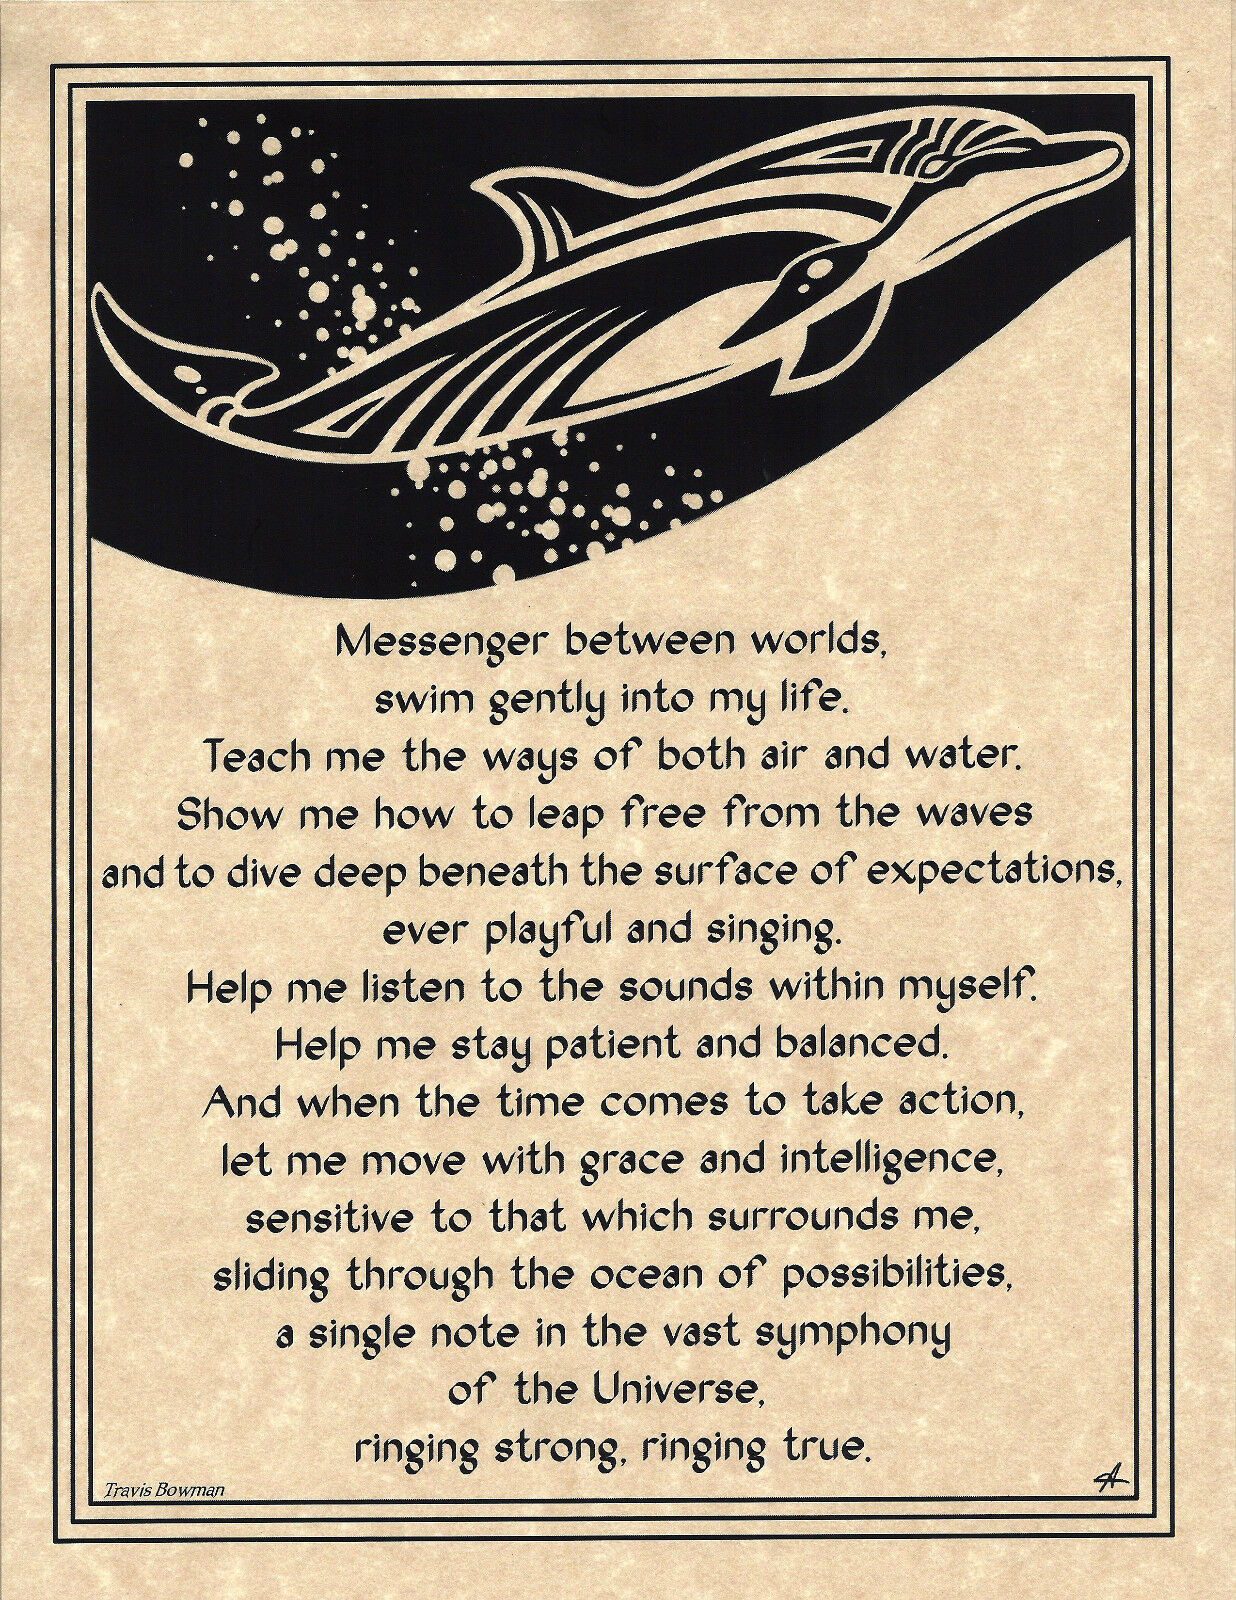 Dolphin animal-totem totem pole spirit guide, dolphin transparent.